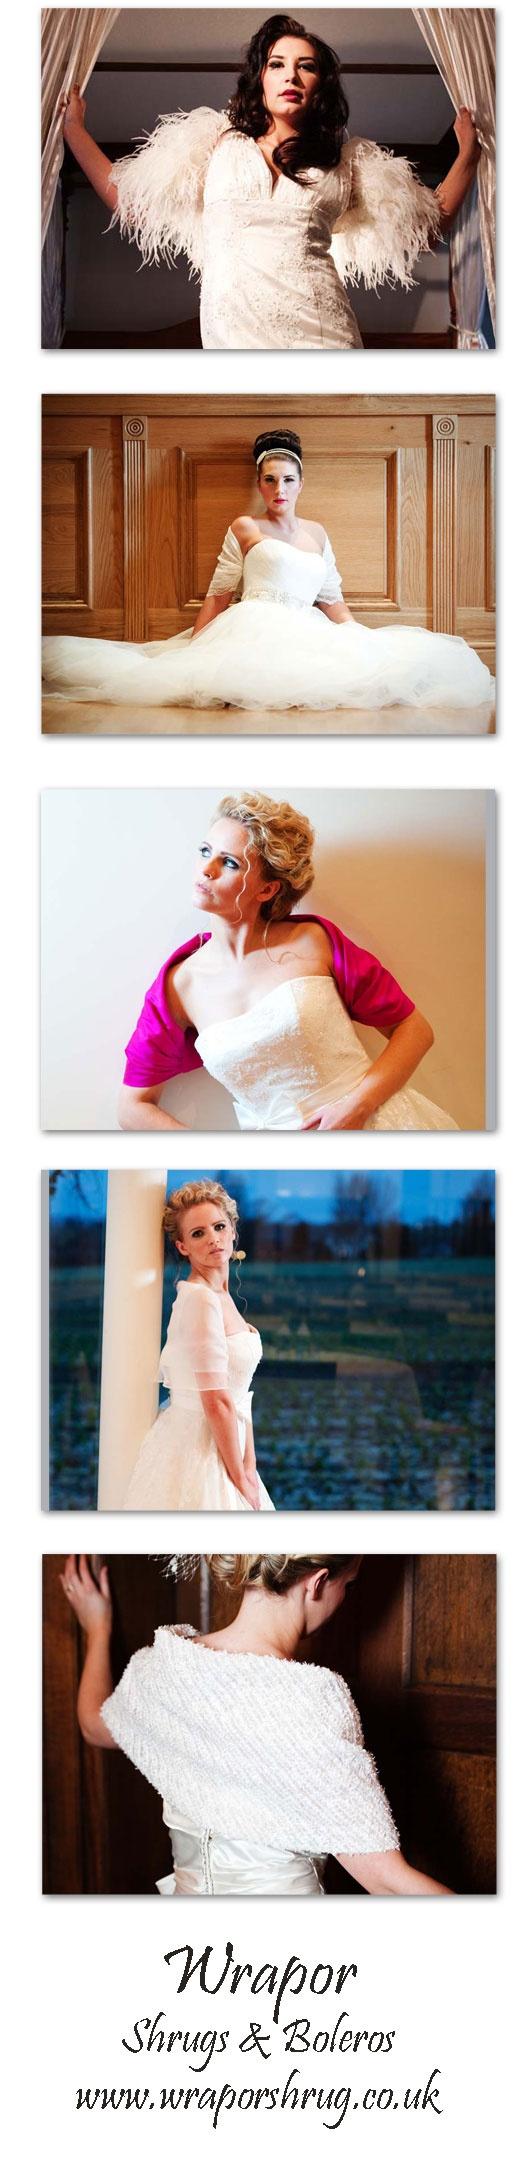 38 best Wedding Shrugs & Boleros images on Pinterest | Boleros ...